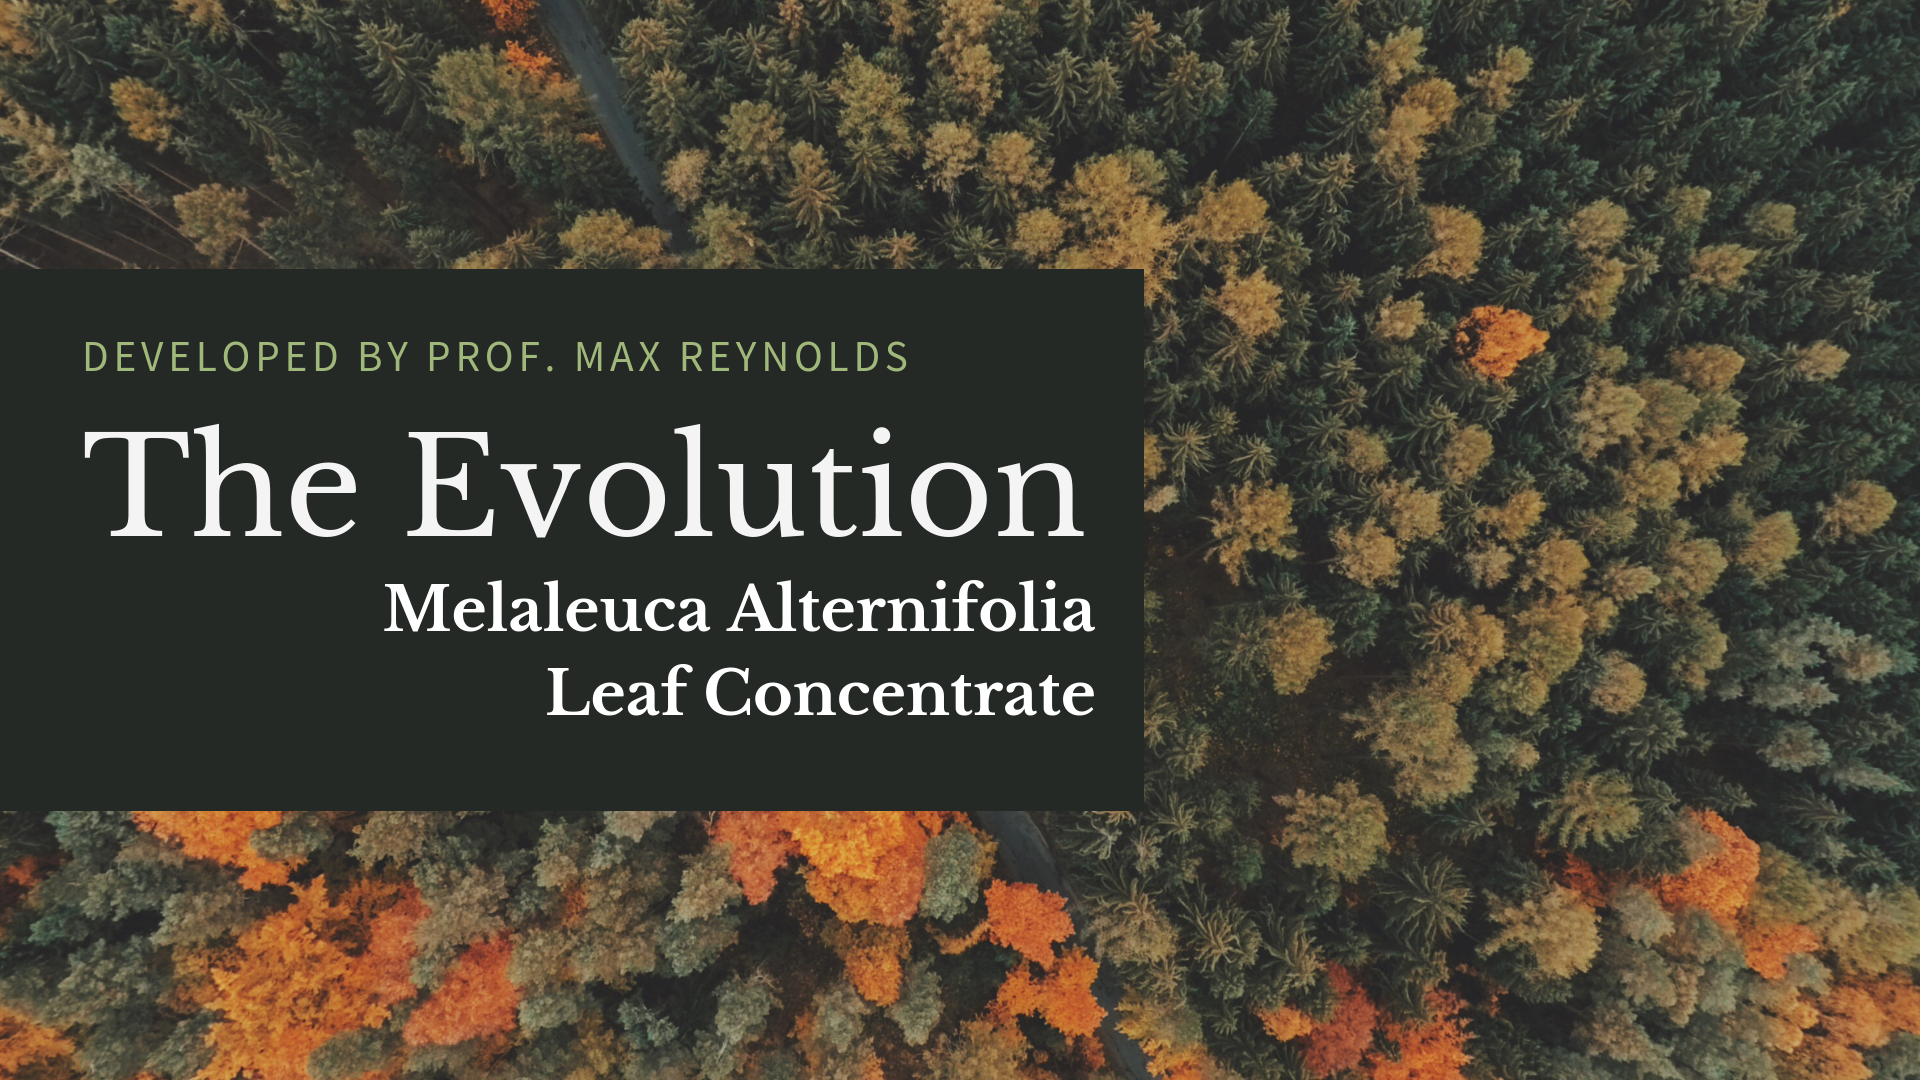 Evolution of Melaleuca Alternifolia